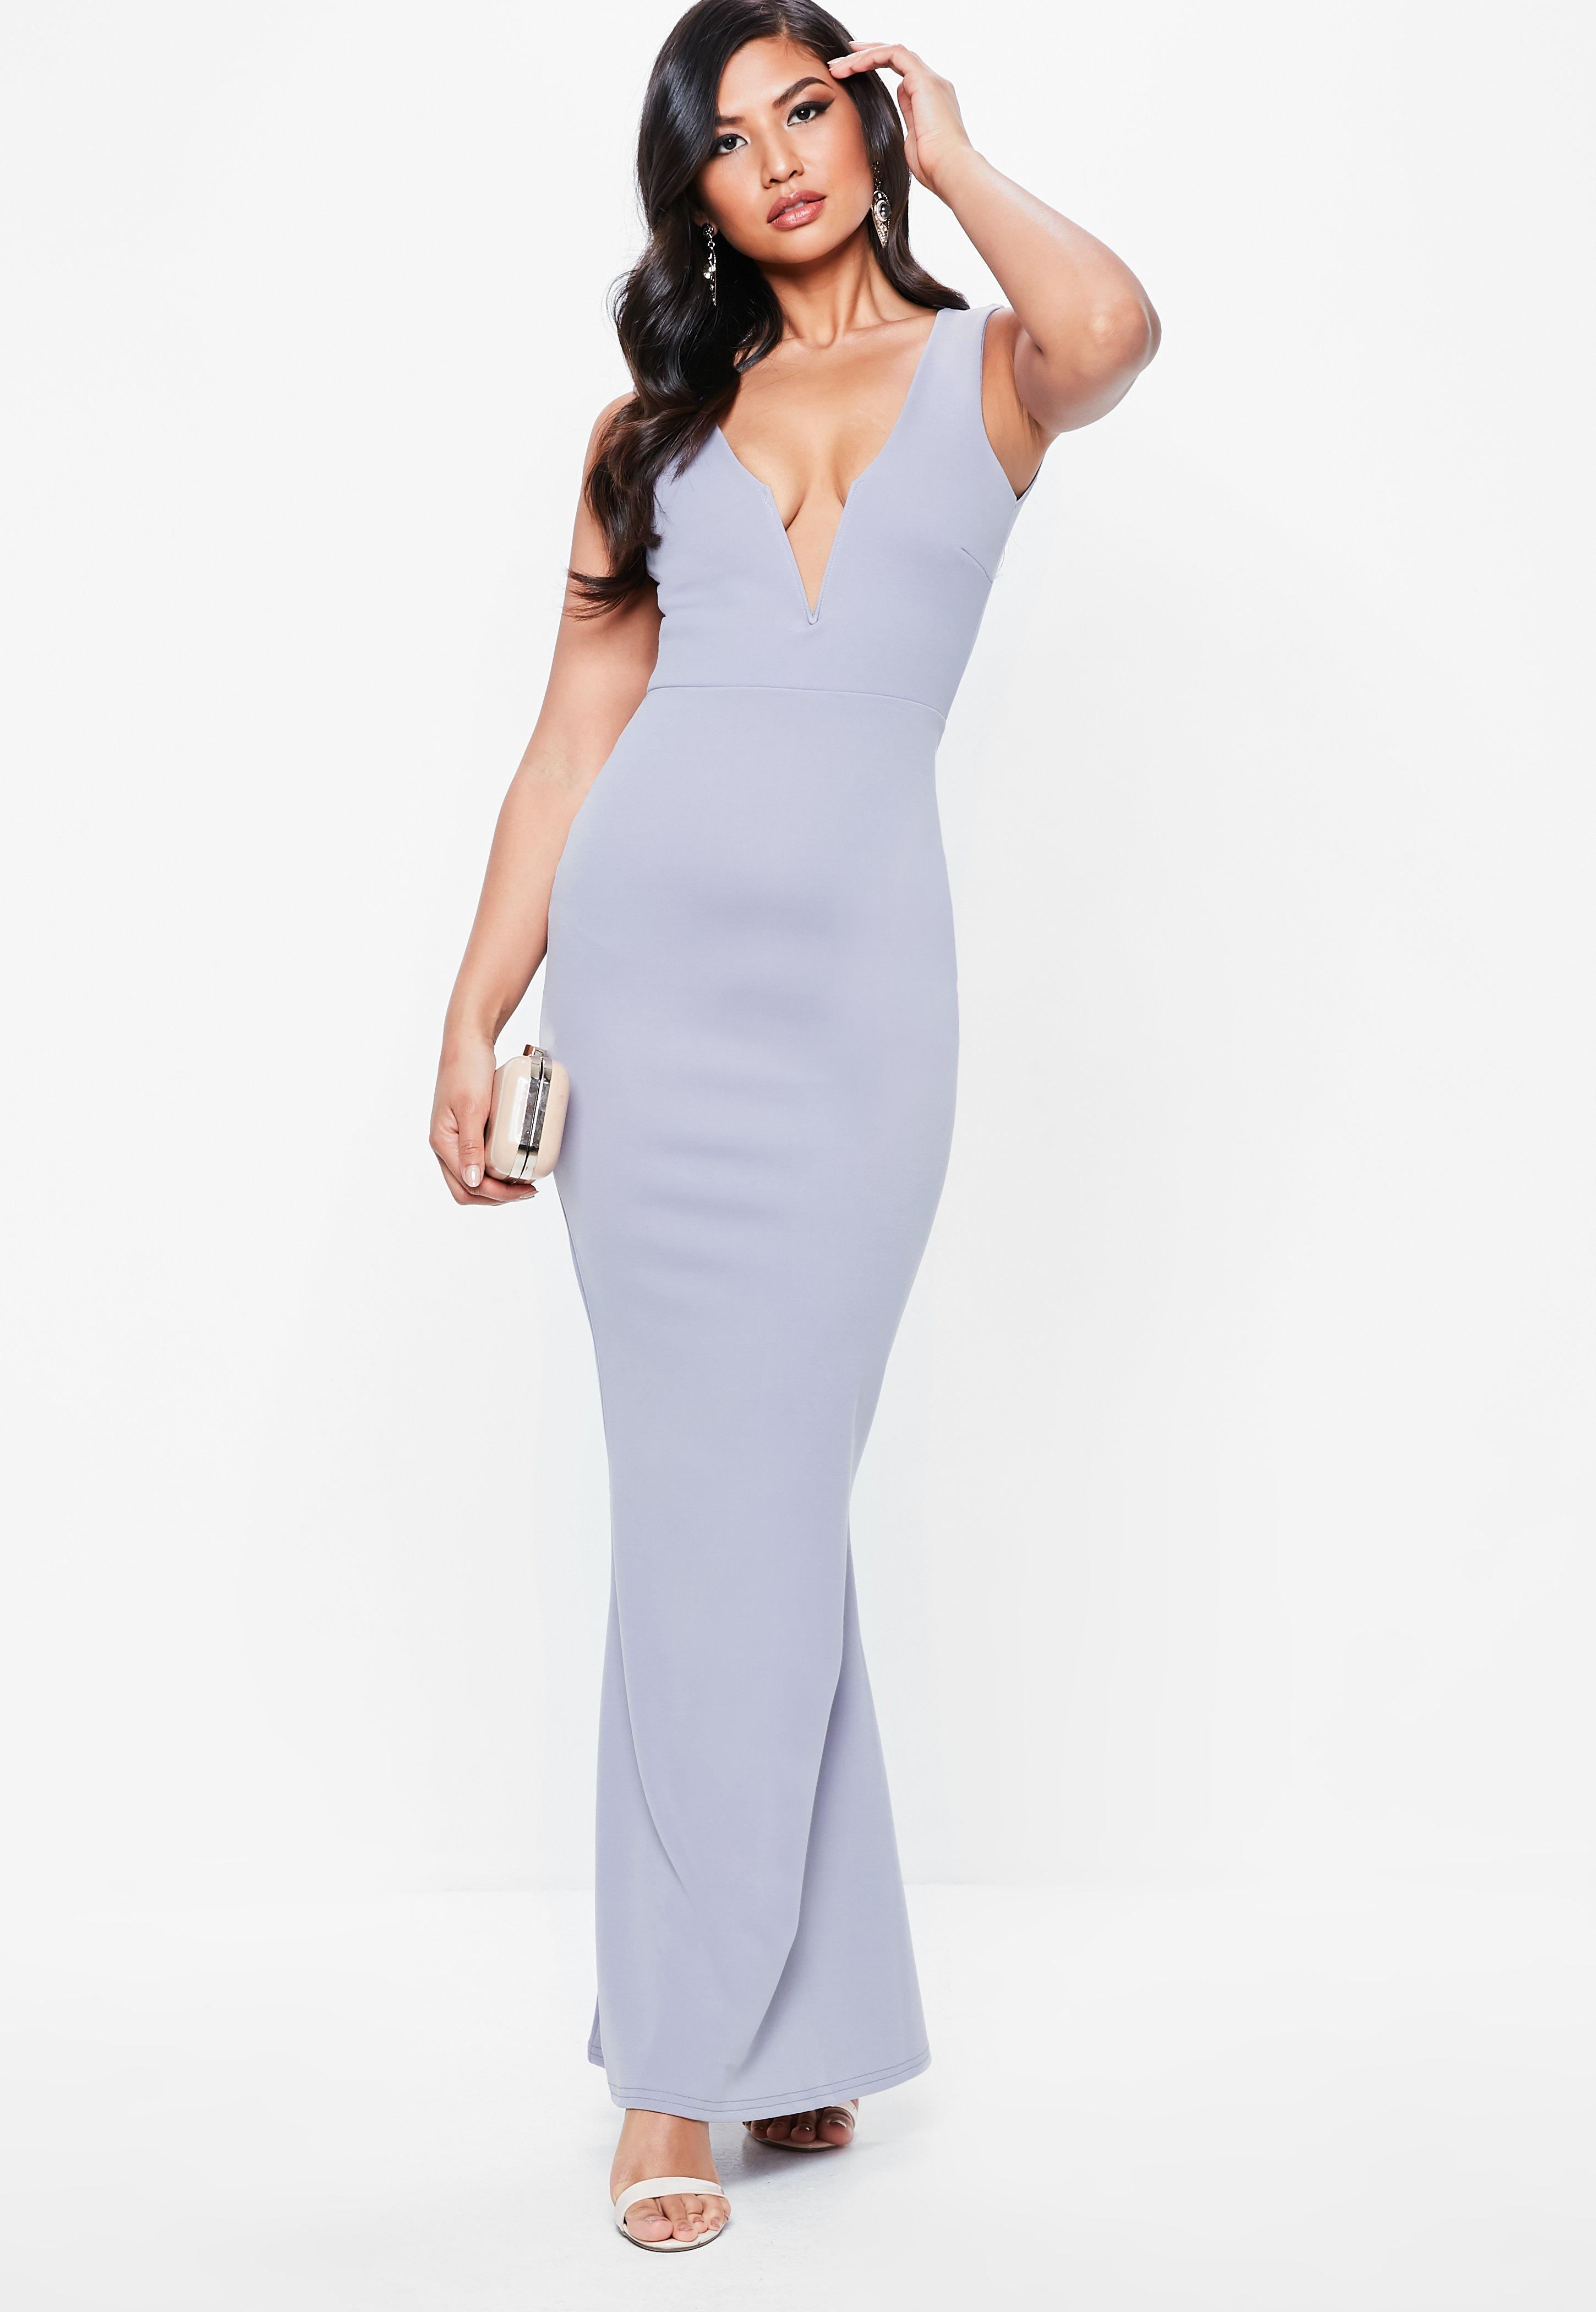 Prom Dresses 2018 - Long & Short Dance Dresses | Missguided